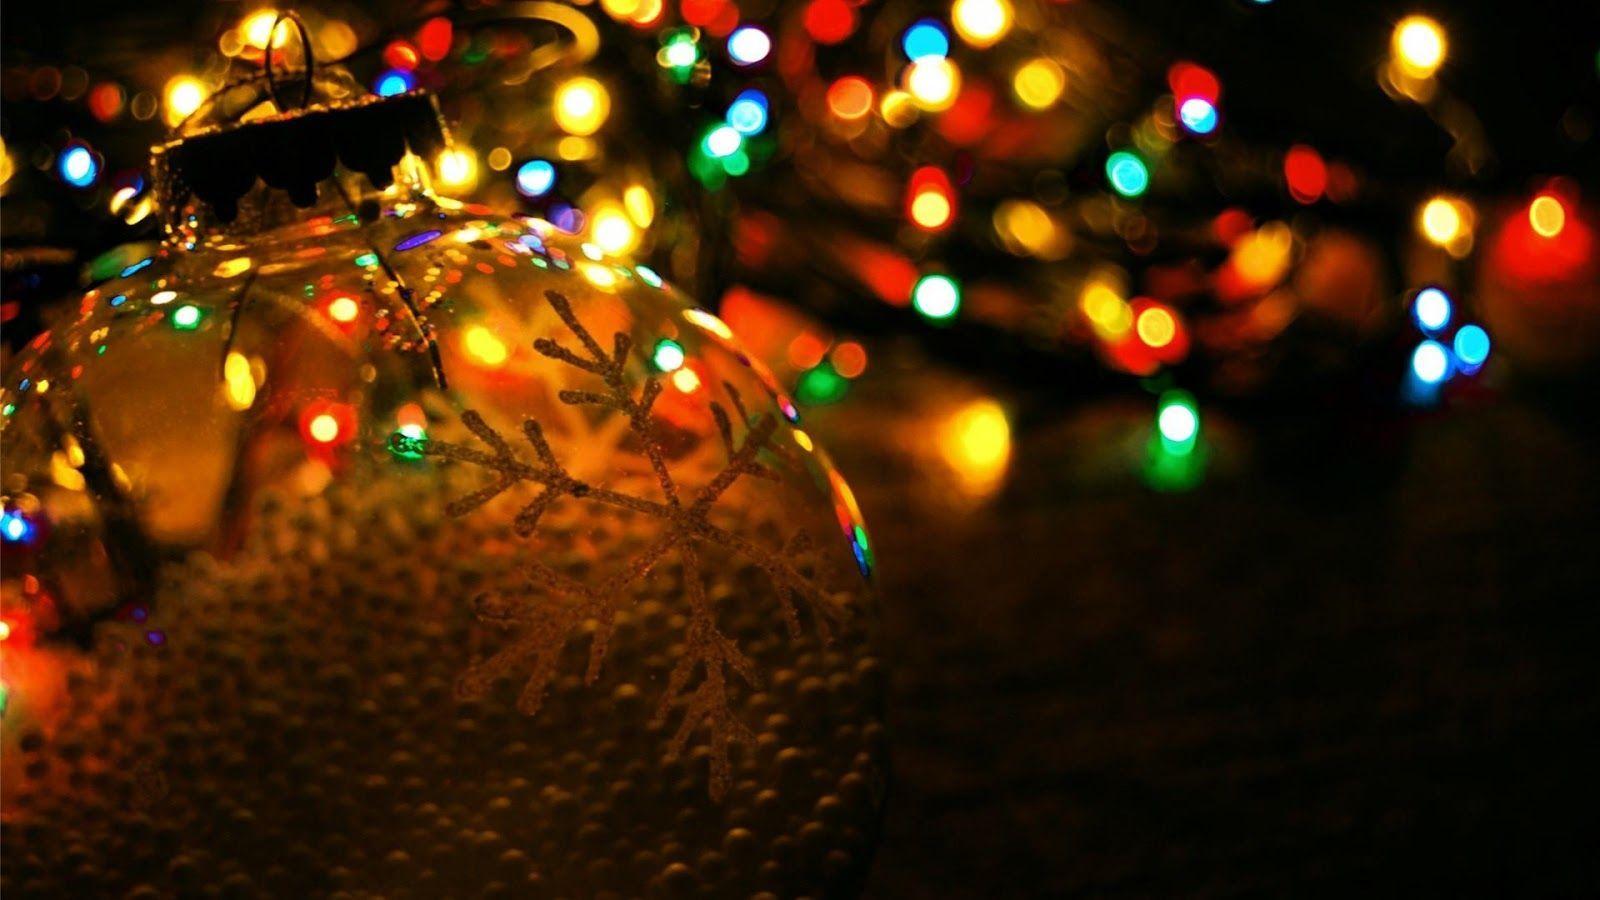 wallpaper of christmas lights